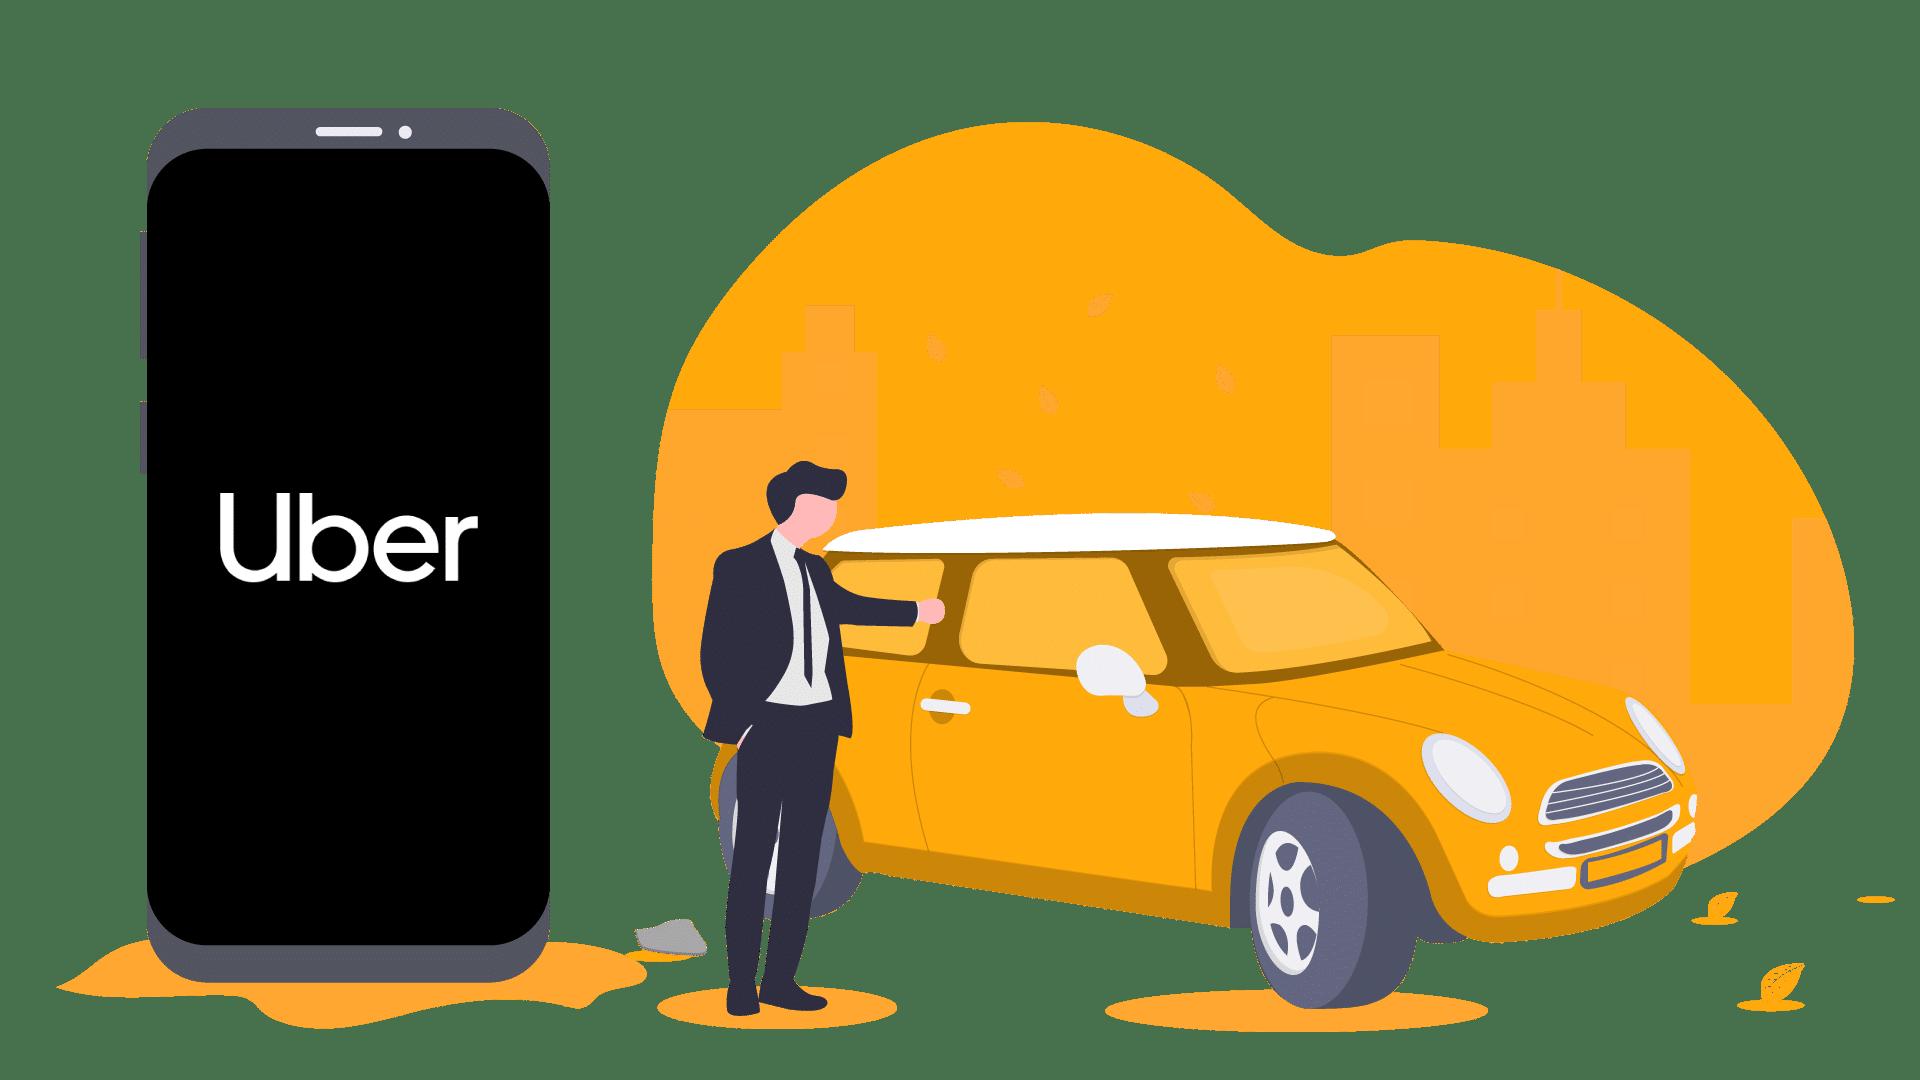 uber contrat travail cassation